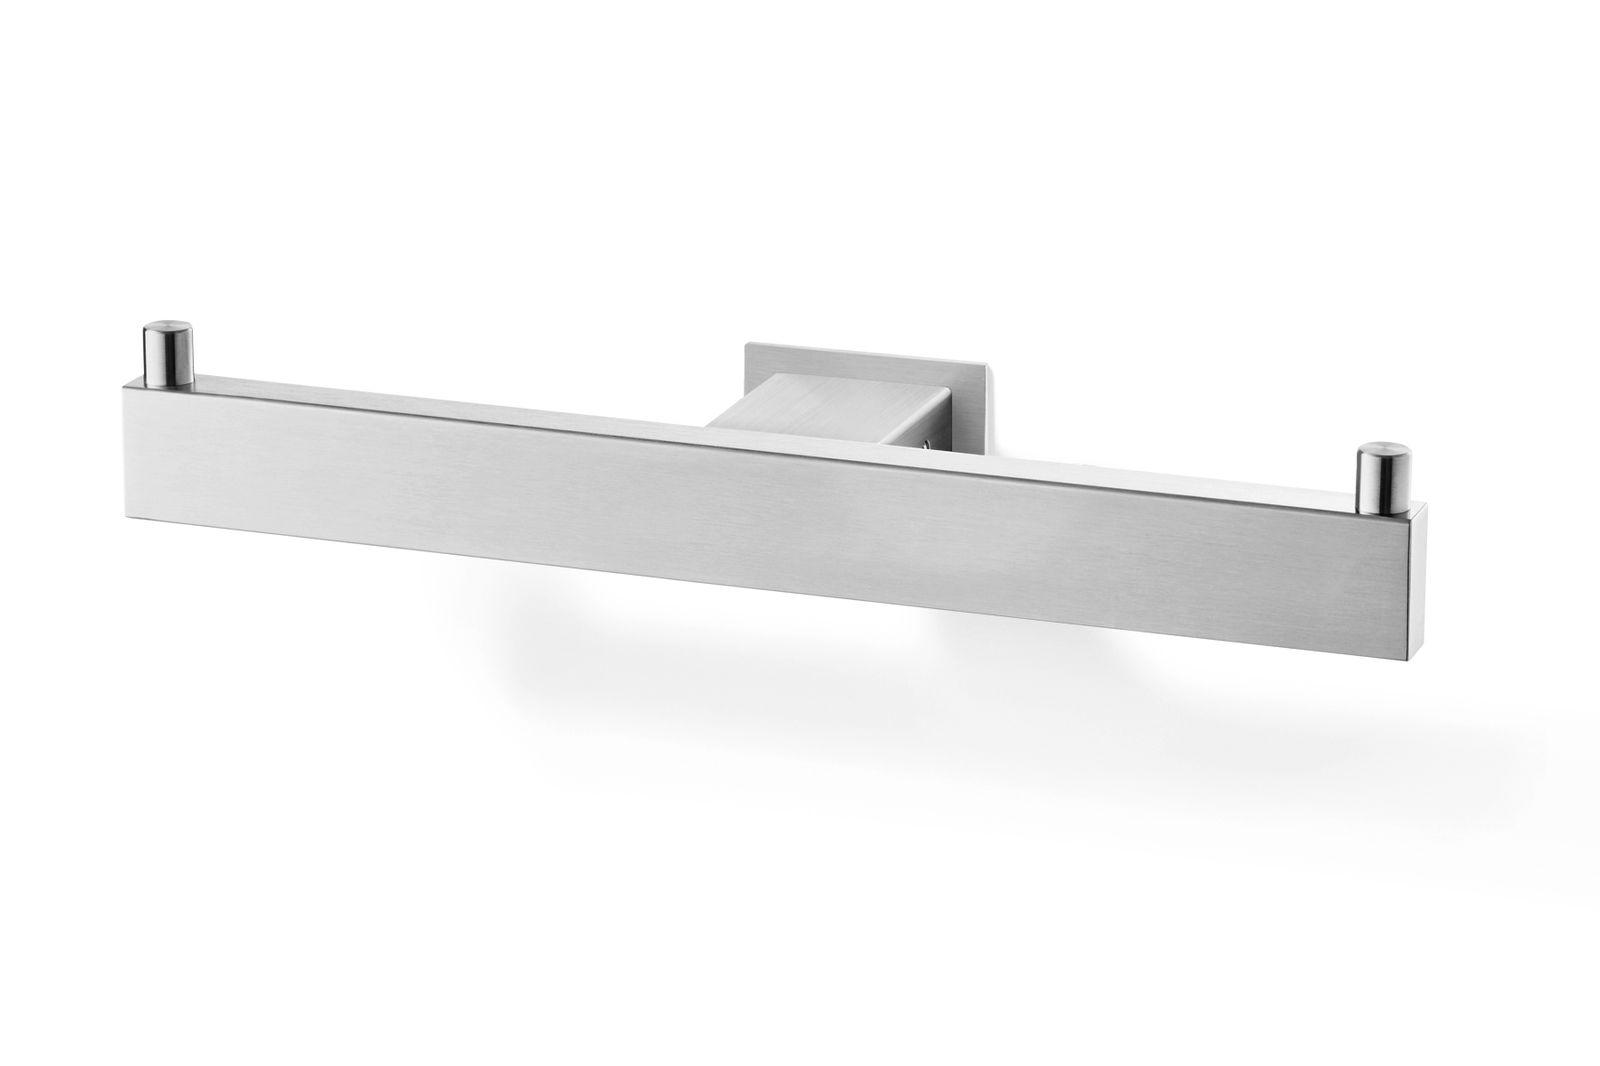 zack doppel toilettenpapierhalter linea wc rollenhalter edelstahl matt 40370 bad bad edelstahl. Black Bedroom Furniture Sets. Home Design Ideas